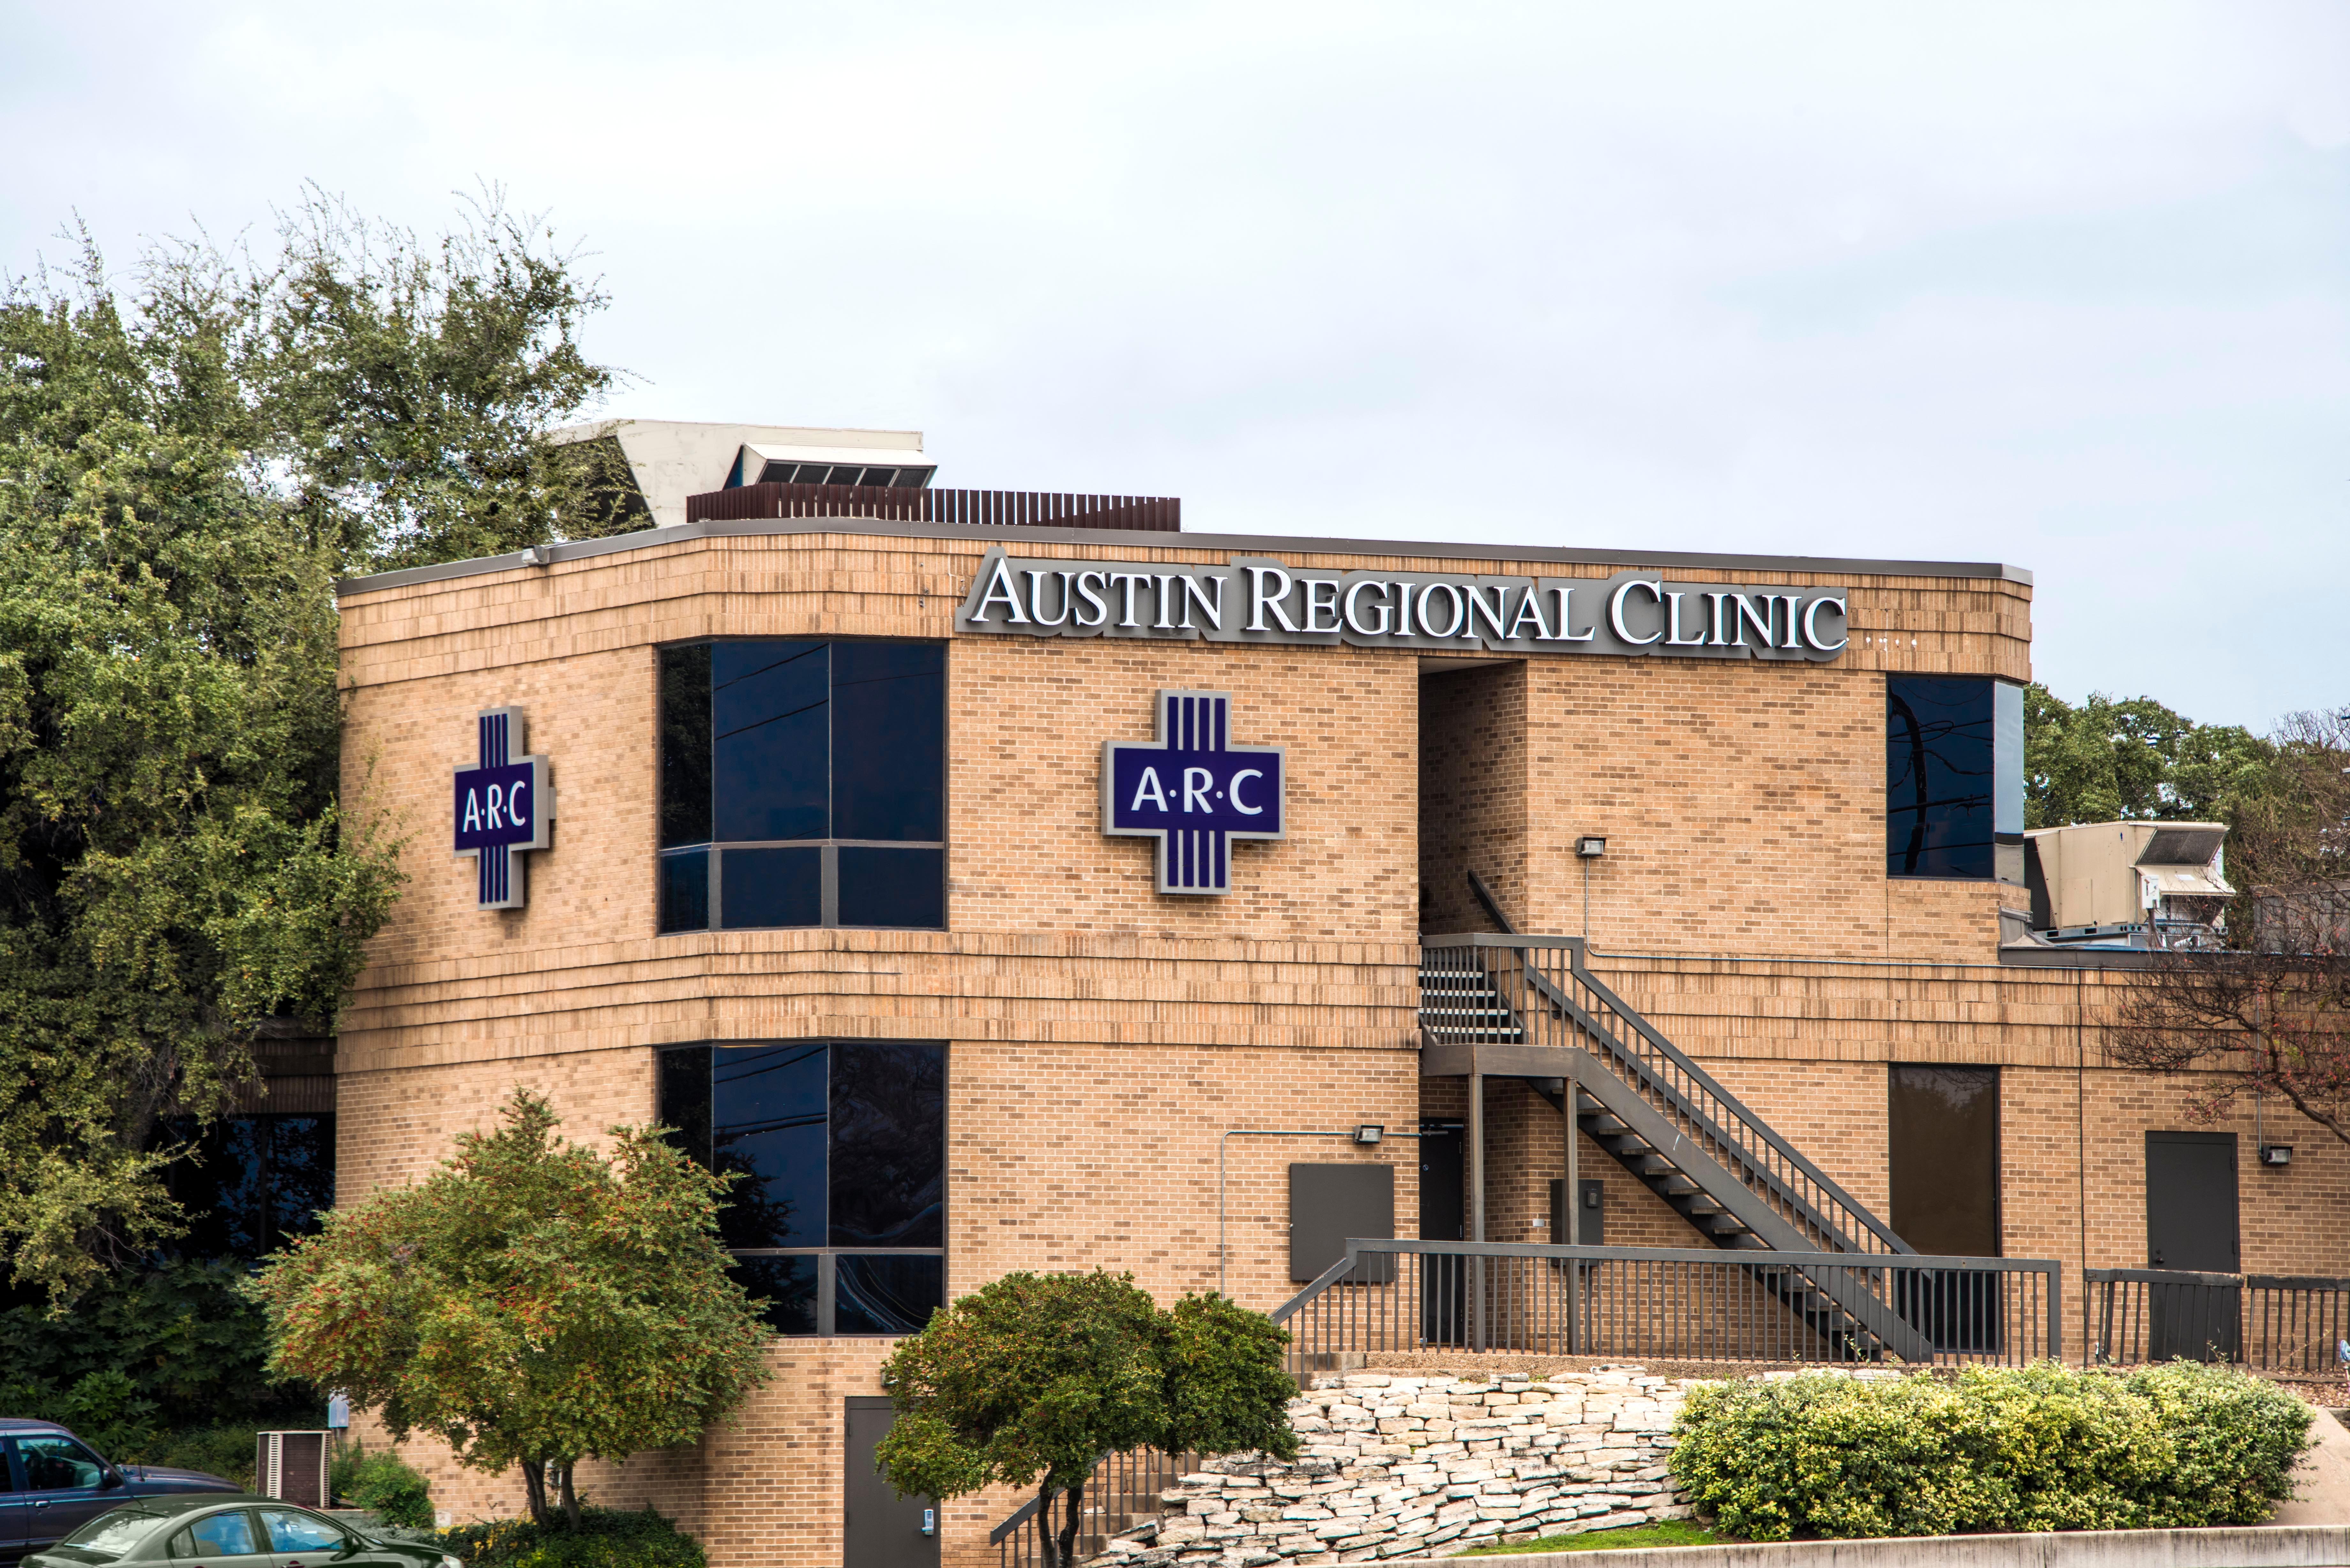 Austin Regional Clinic: ARC  South 1st